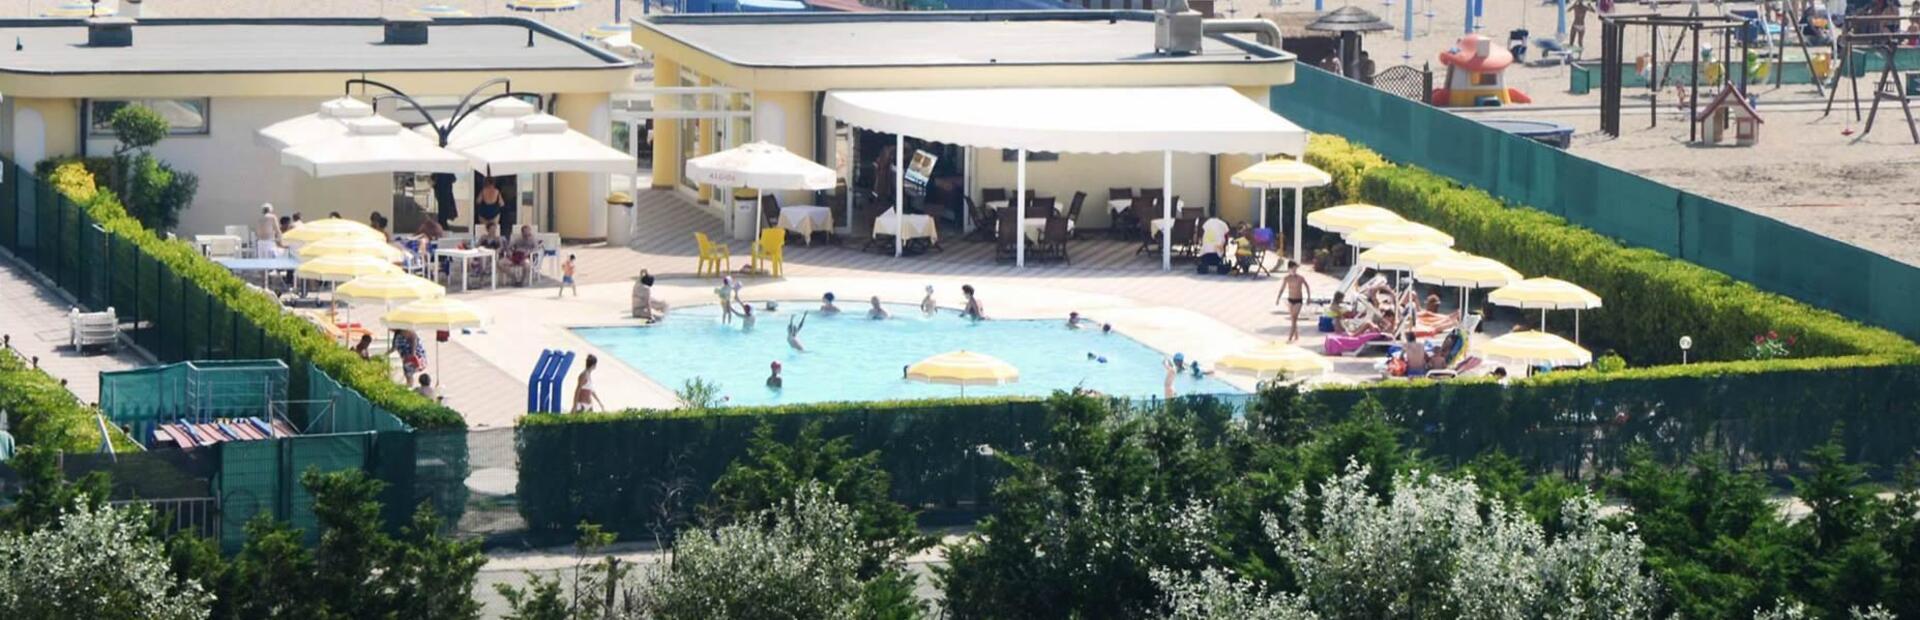 hotel-sole de pool-strand 001